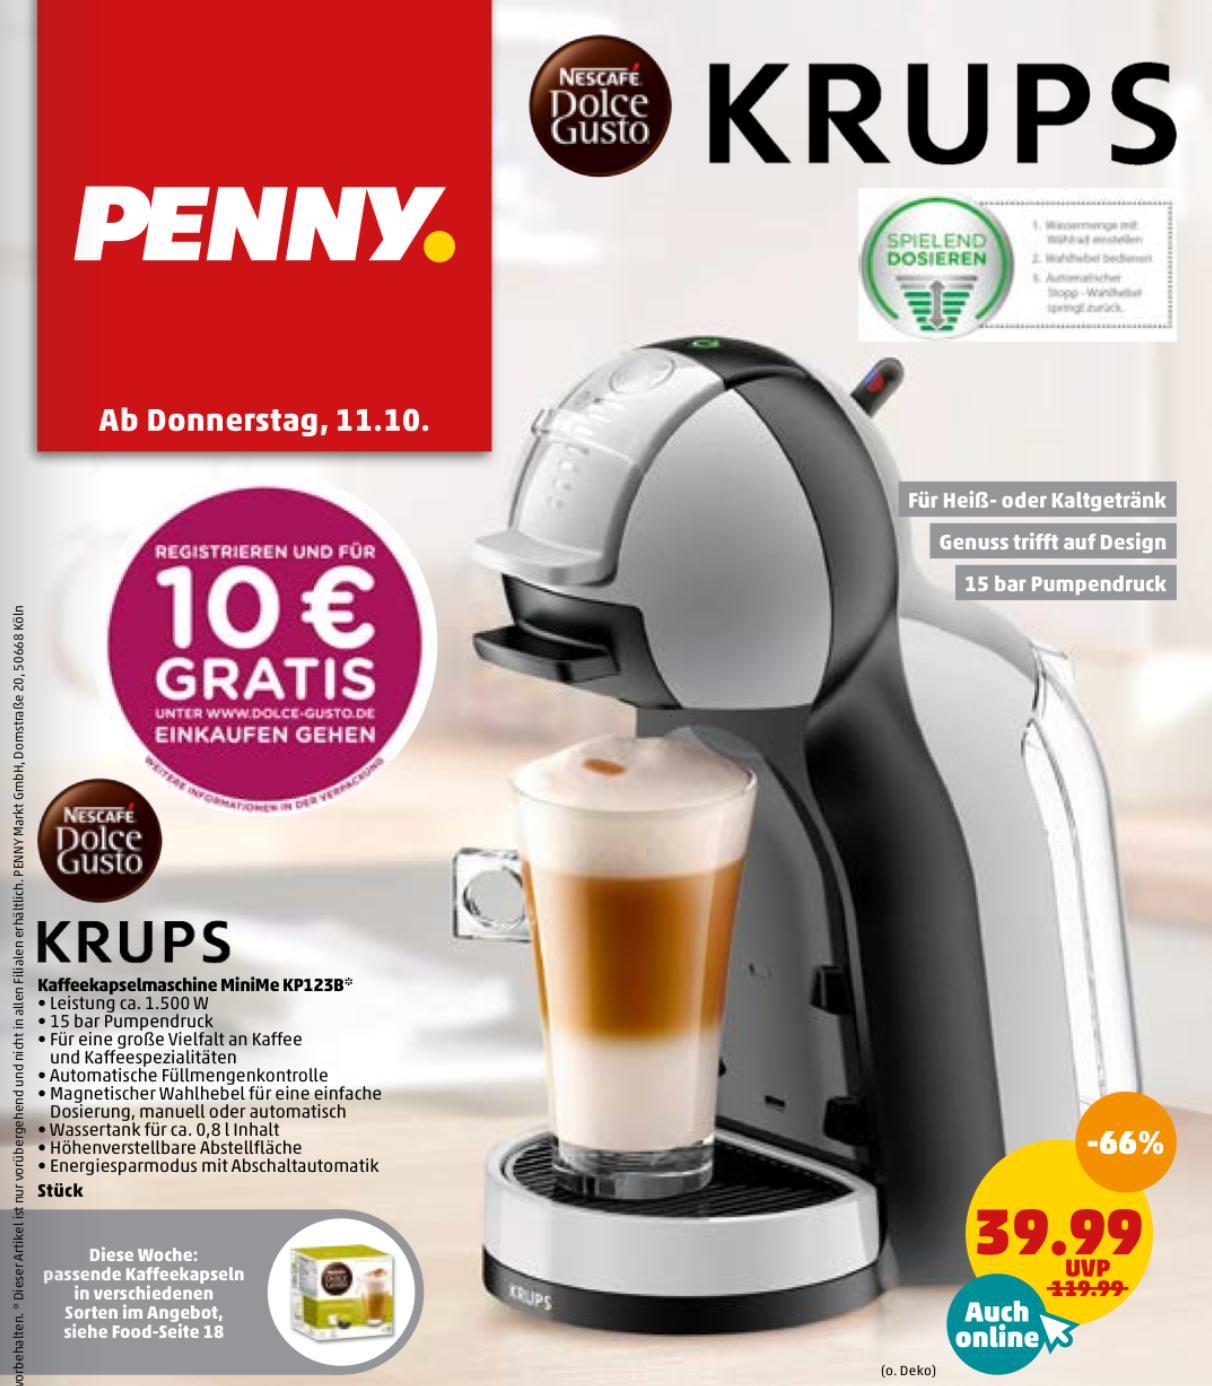 Penny Dolce Gusto Krups Minime Kp123b Für Nur 3999 Mydealzde